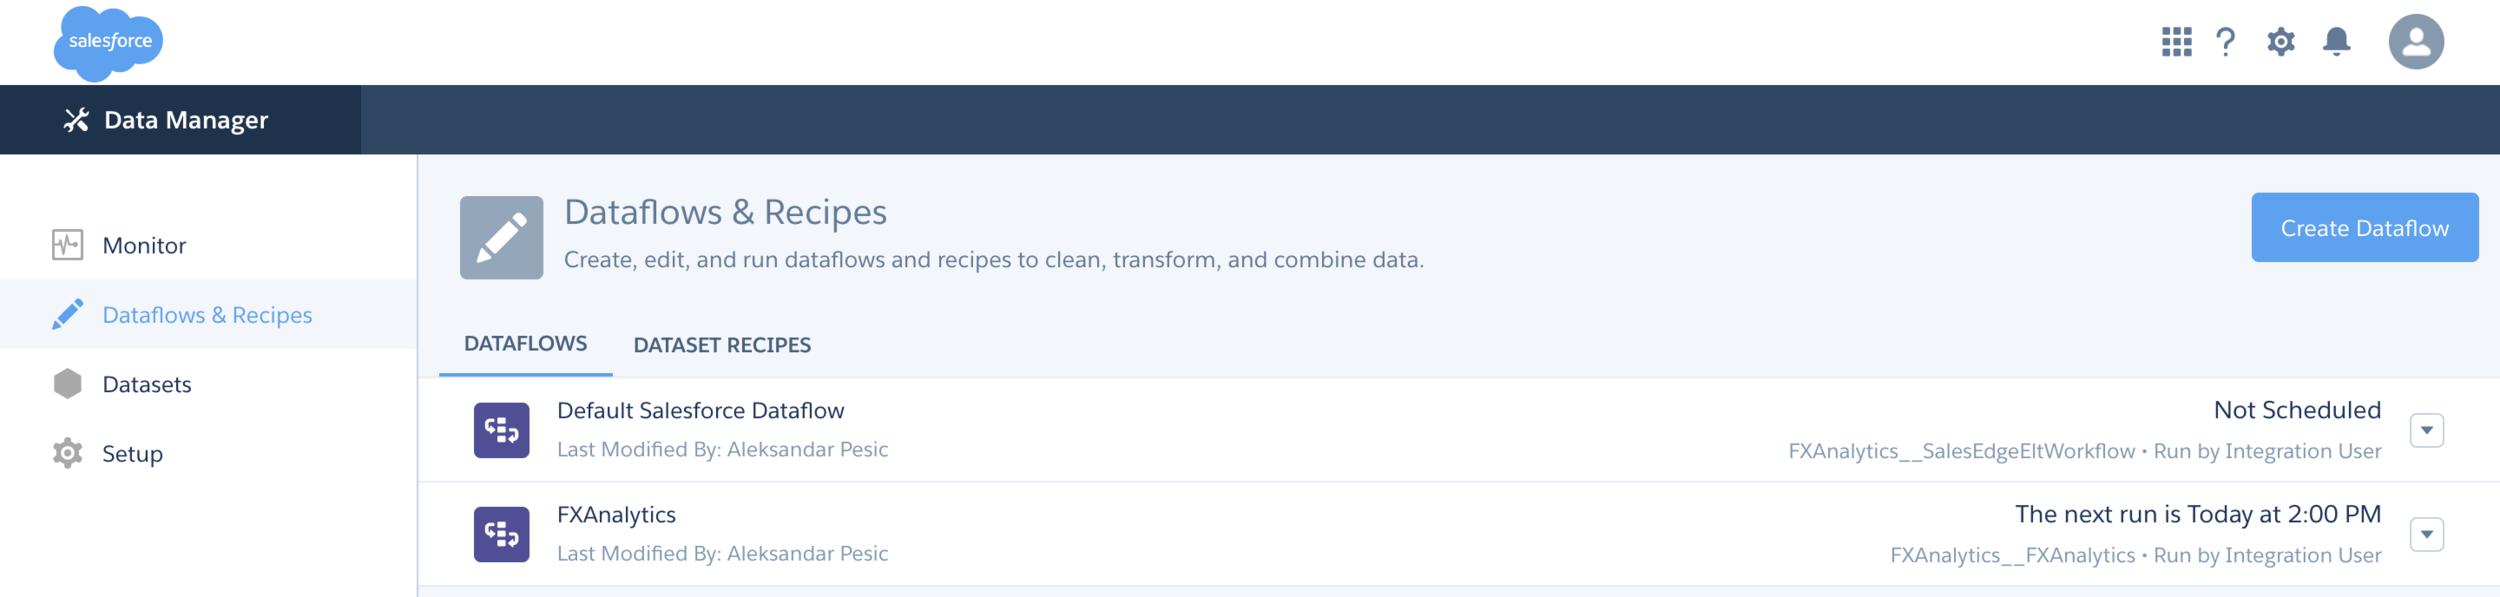 DataflowAndRecipies